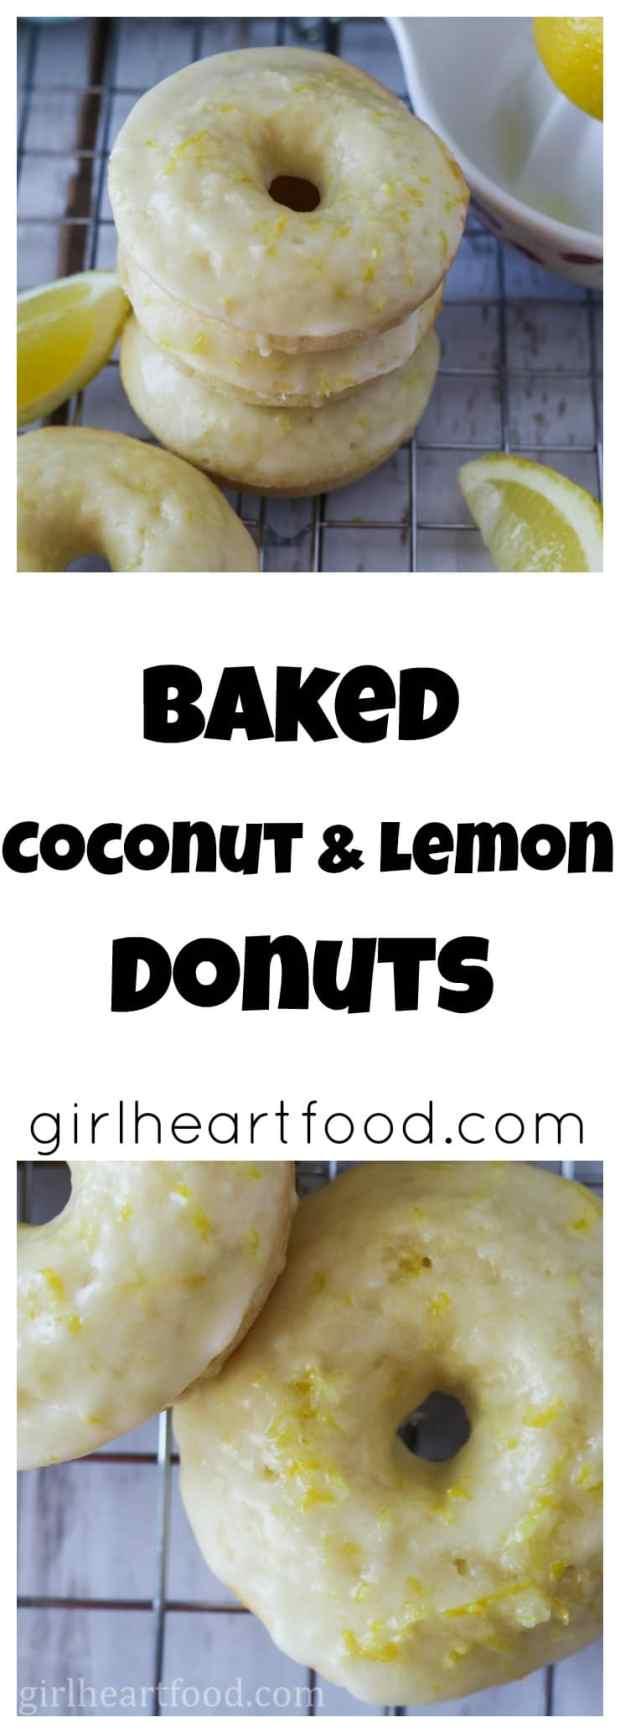 Baked Coconut and Lemon Donuts - girlheartfood.com